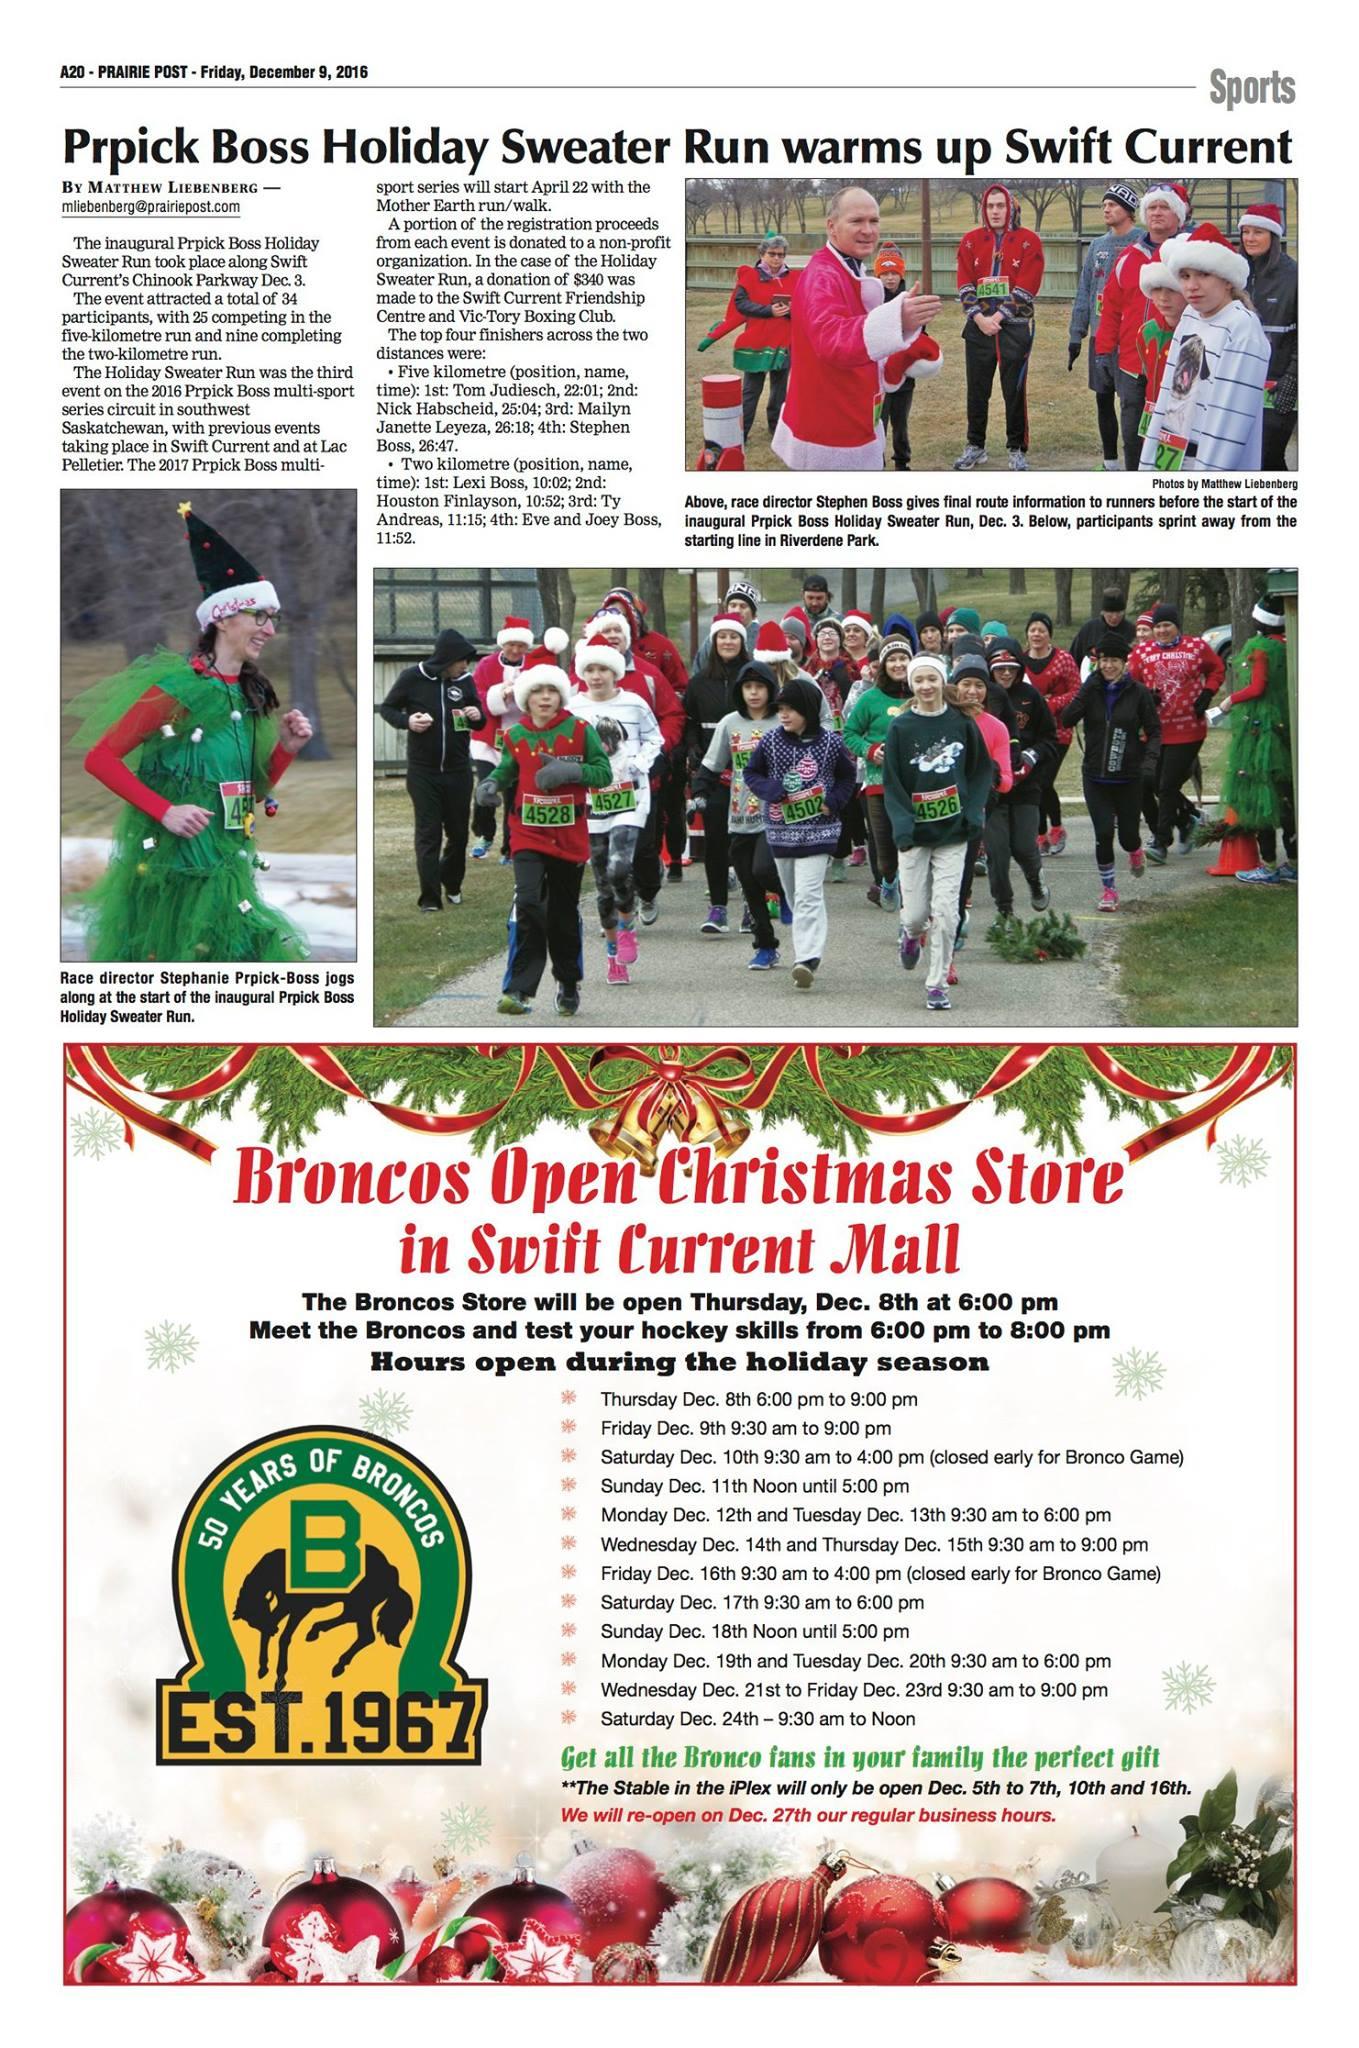 Prairie Post %22Prpick Boss Enterprises Holiday Sweater Run%22 Dec 9, 2016.jpg